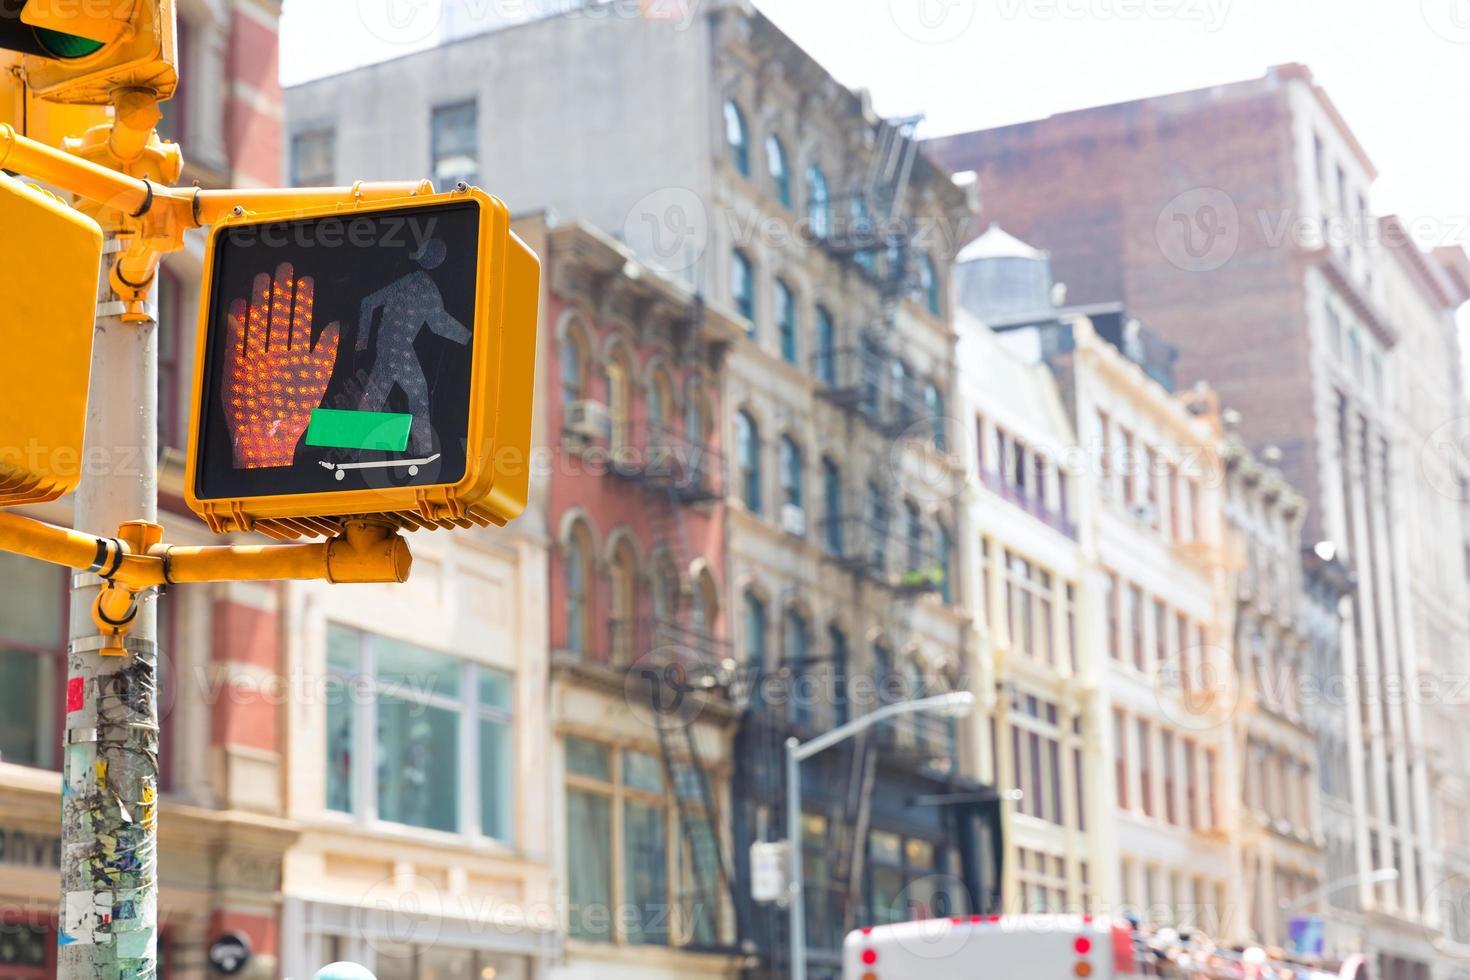 soho stop peaton redlight à manhattan new york photo